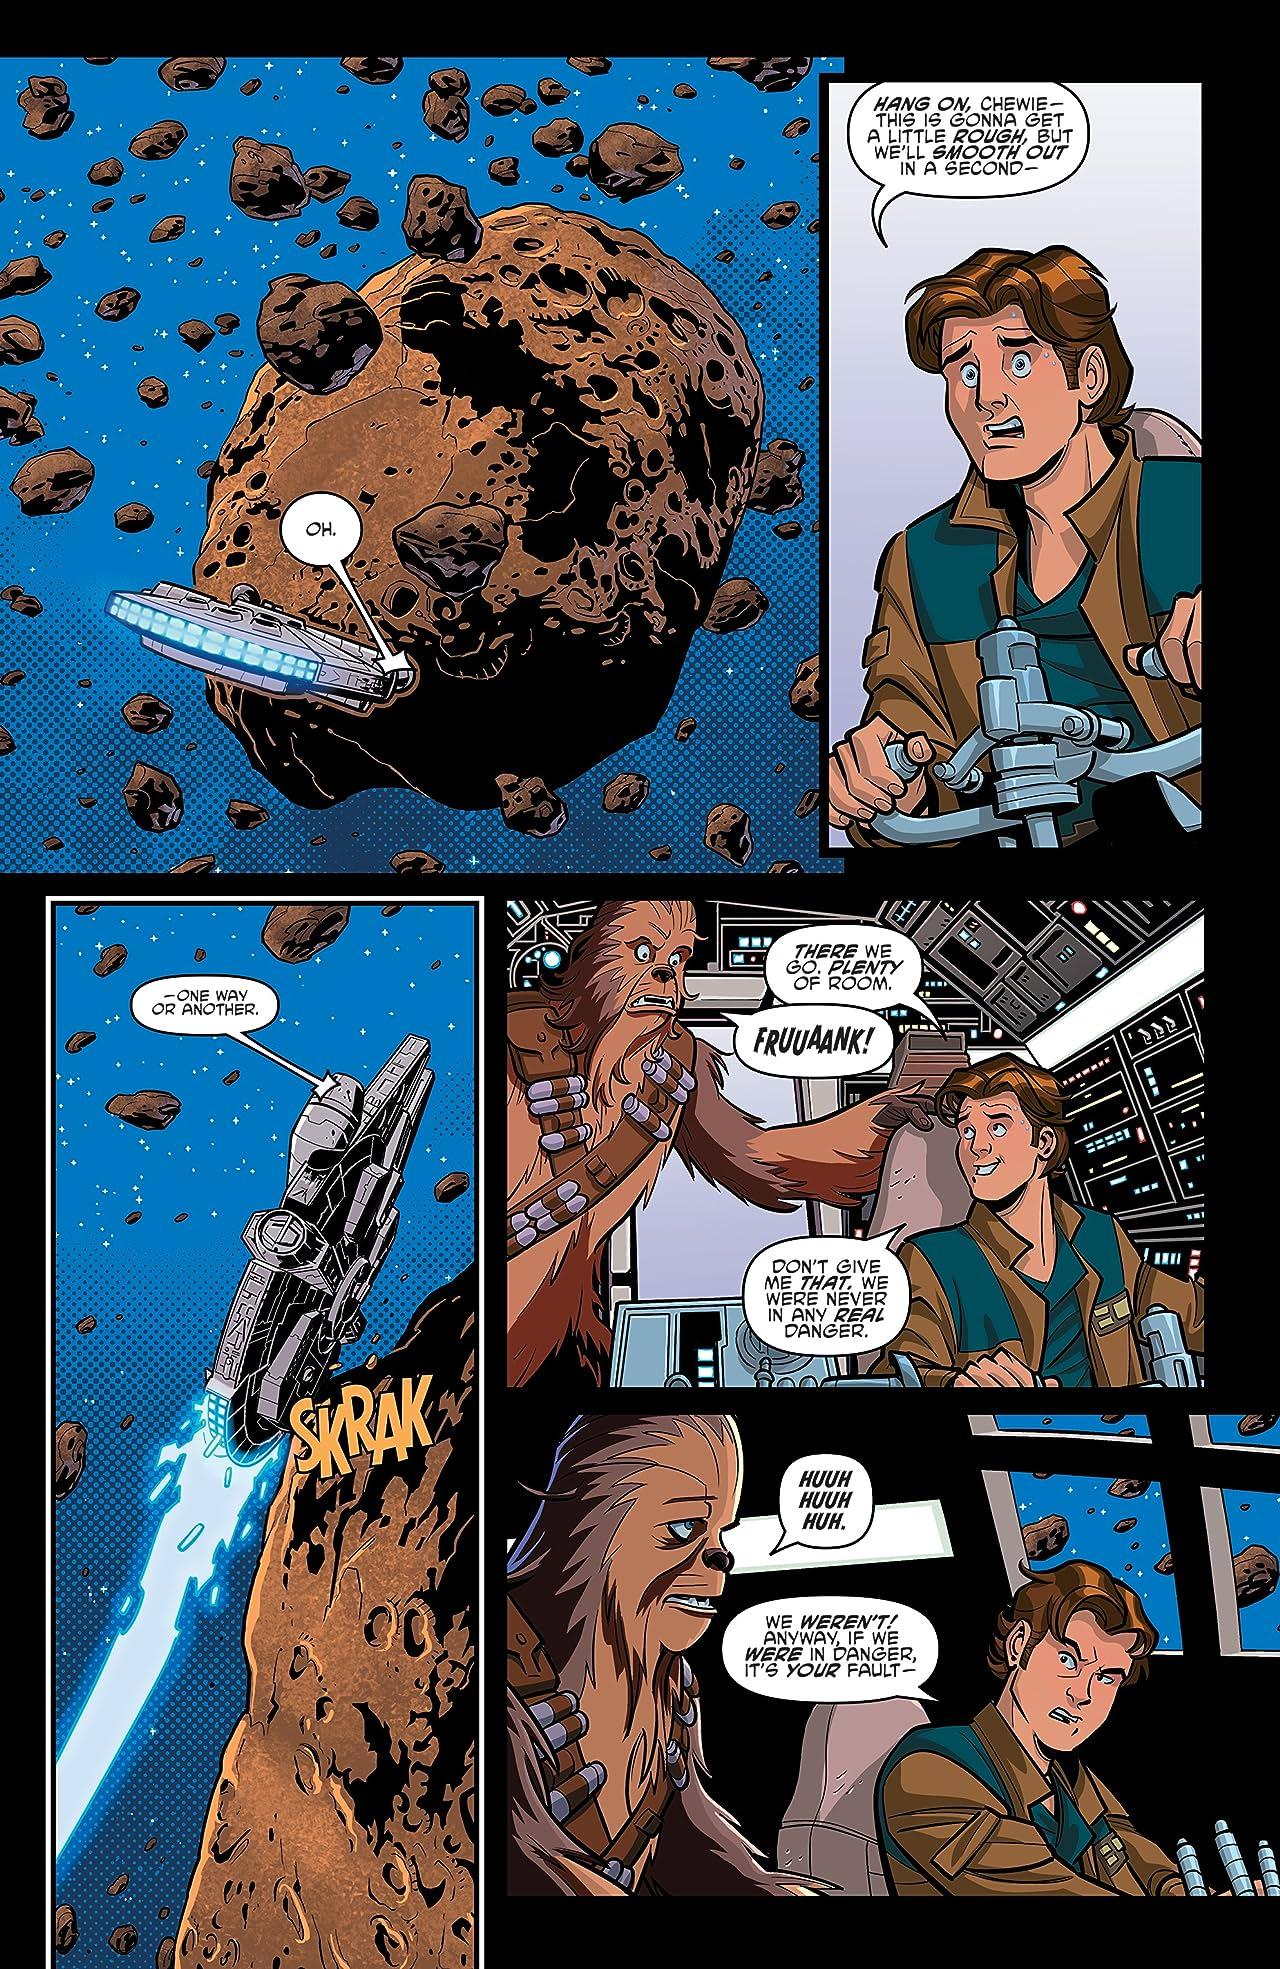 Star Wars Adventures #14